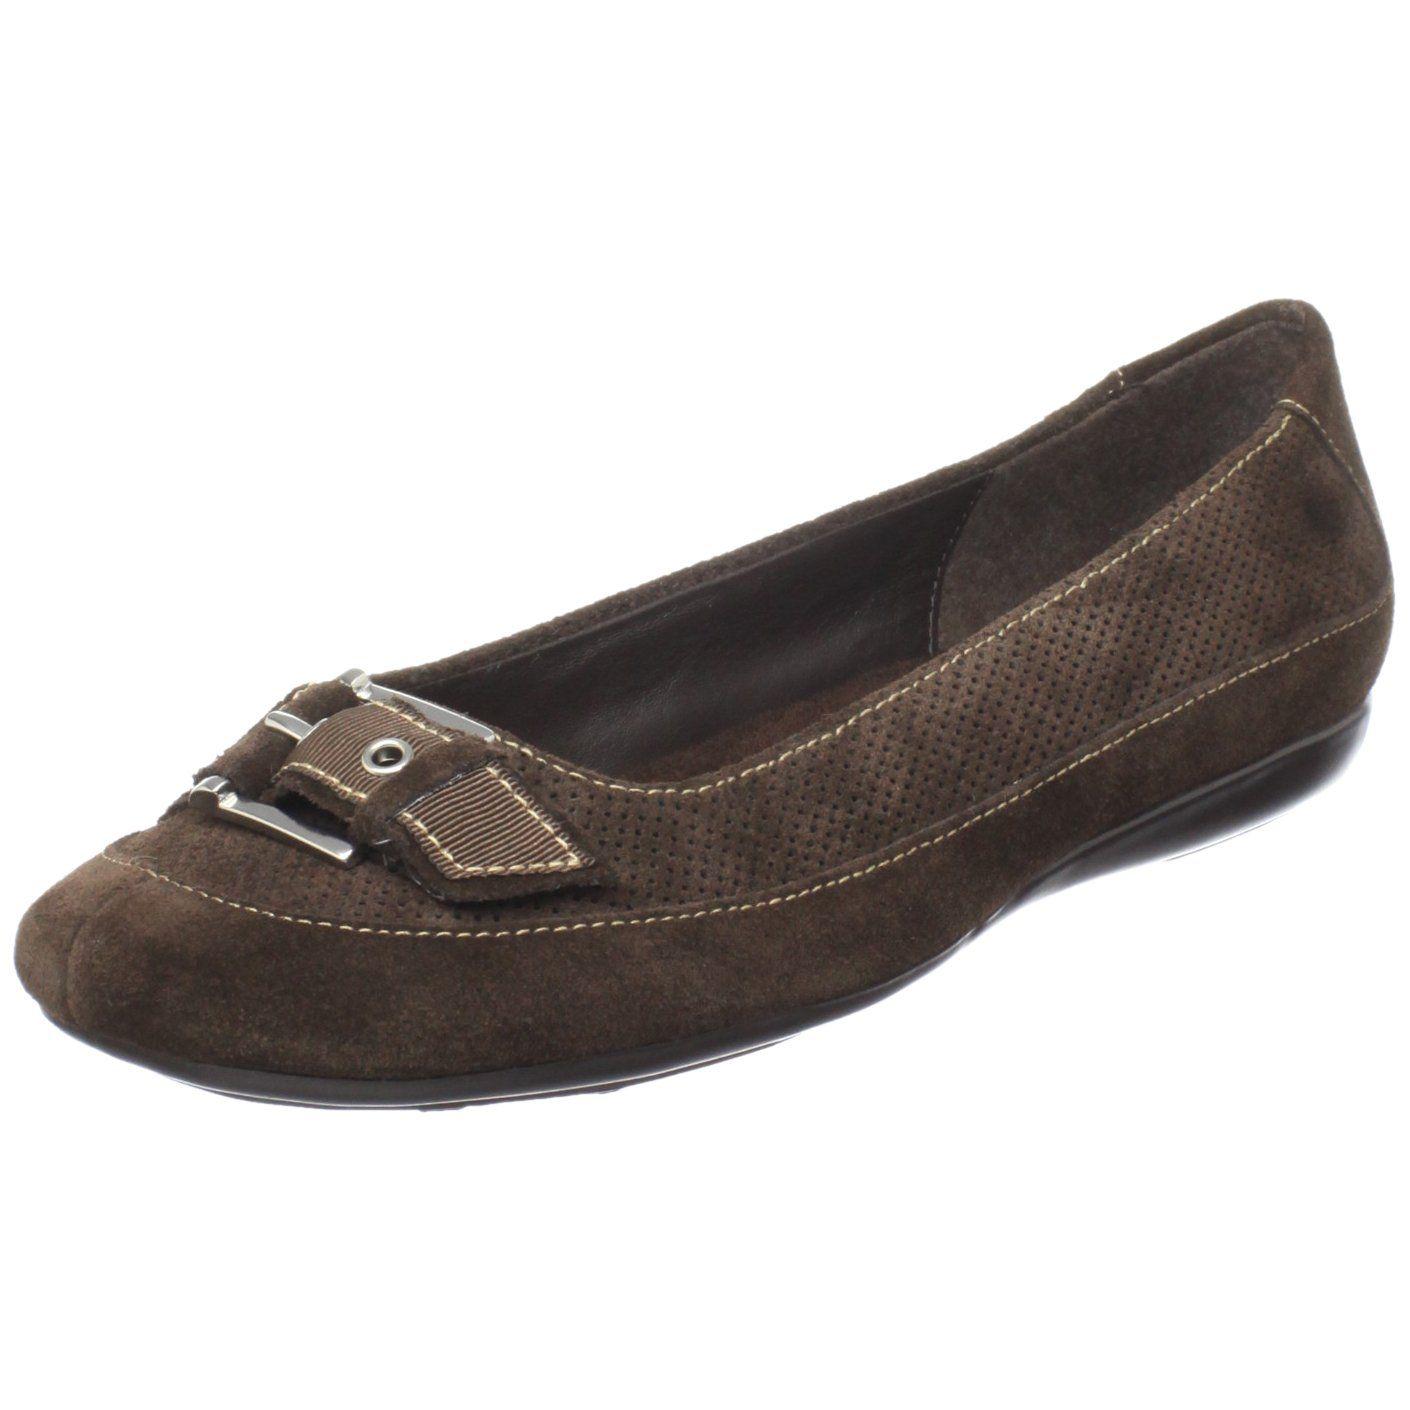 Flat shoes women, Trendy shoes